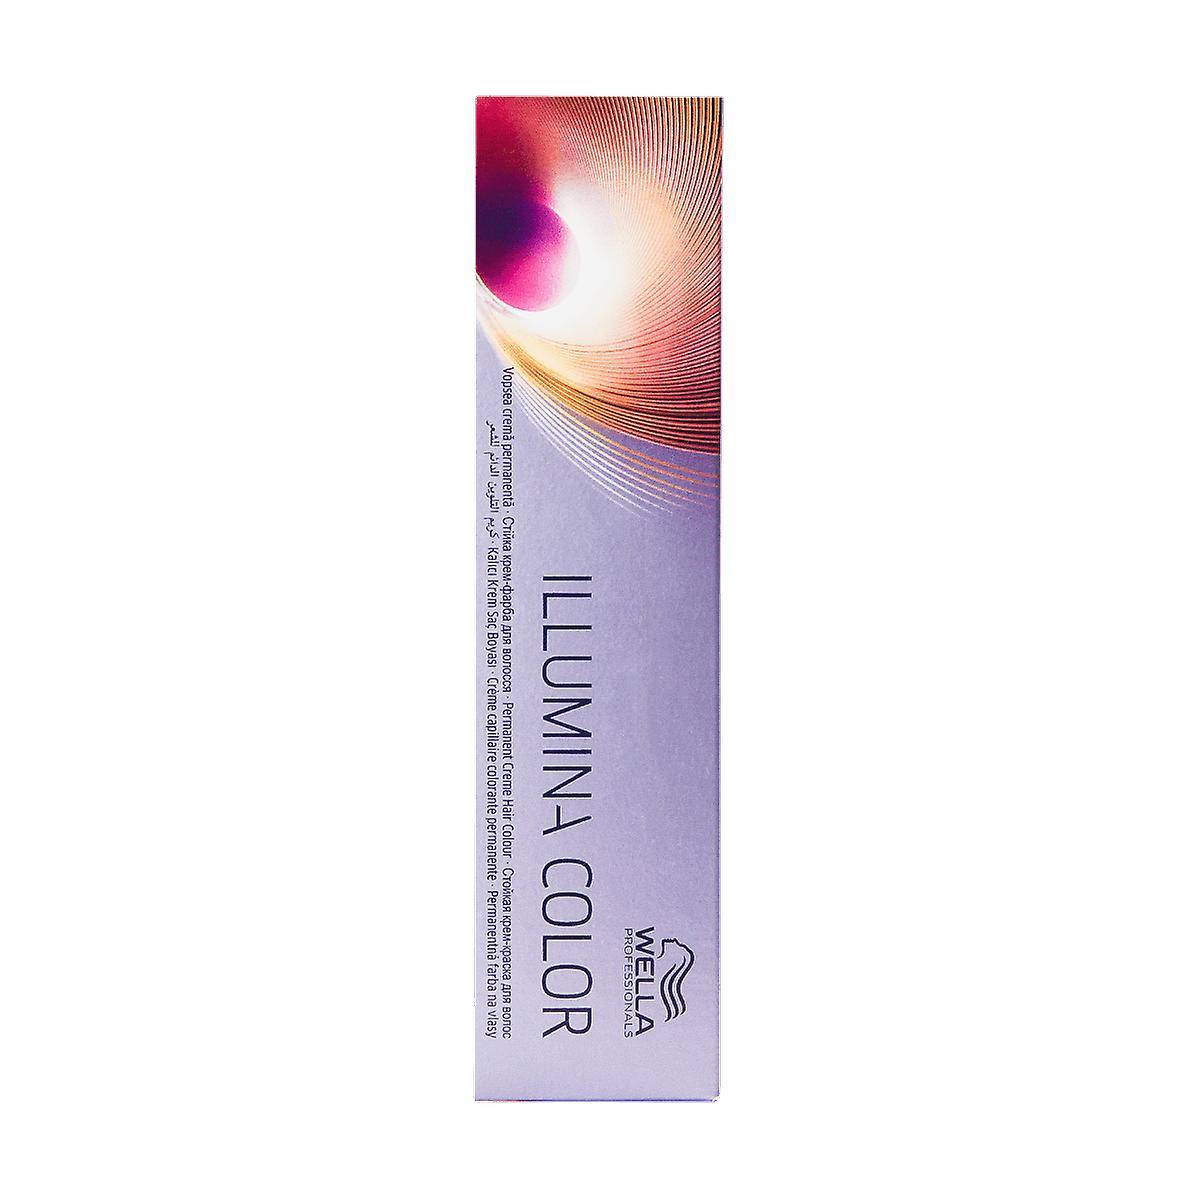 Wella Illumina Hair Colour 5/81 Light Brunette Brown 60ml